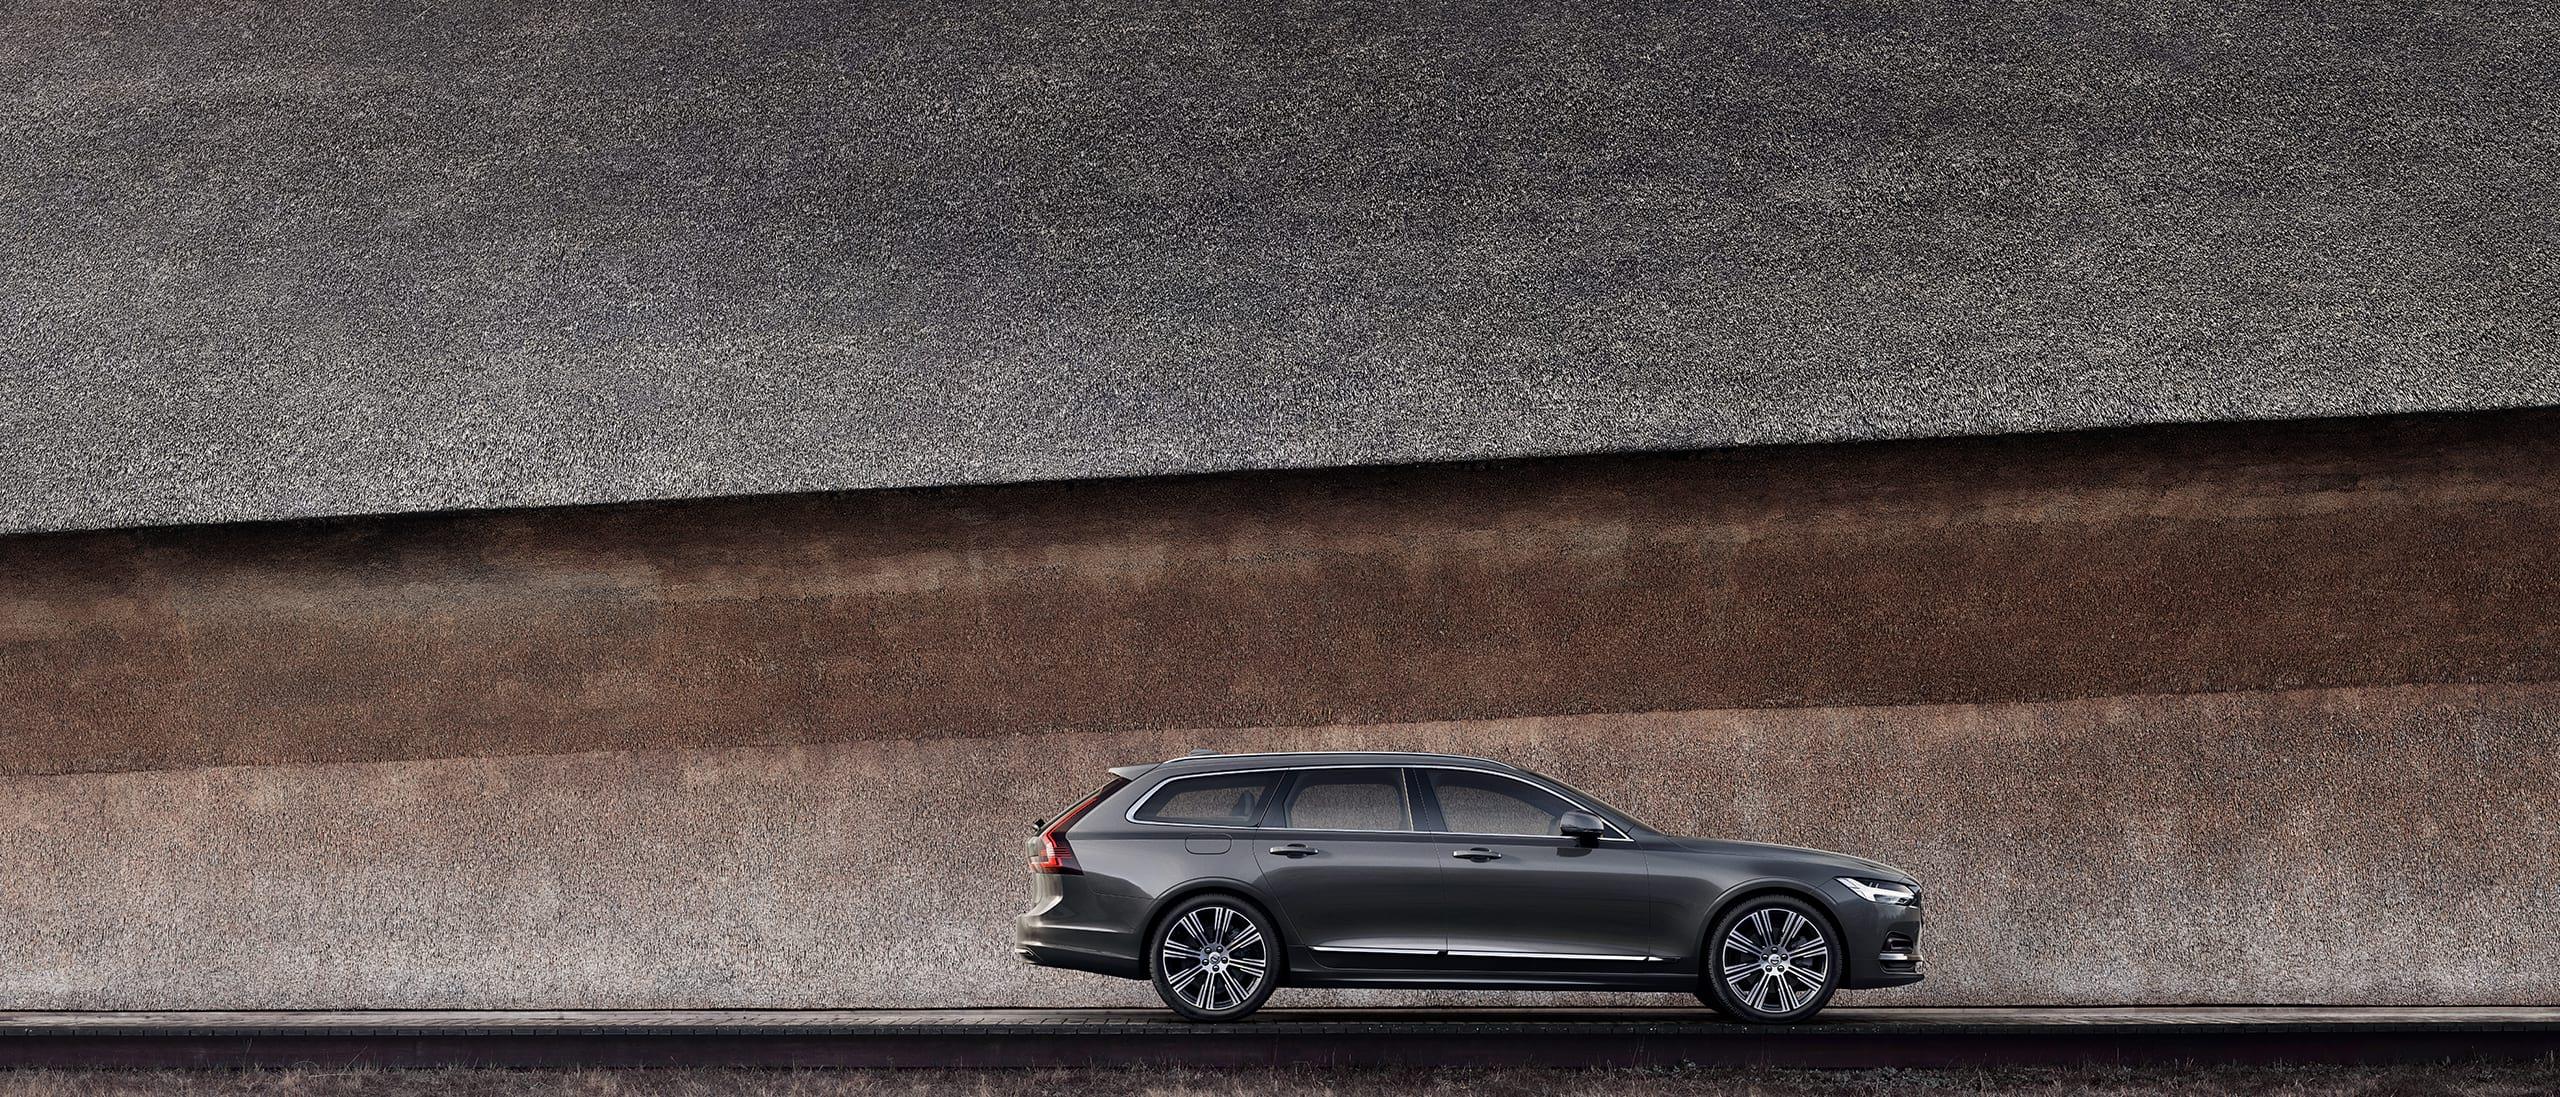 A dark grey Volvo V90 parked against a wall